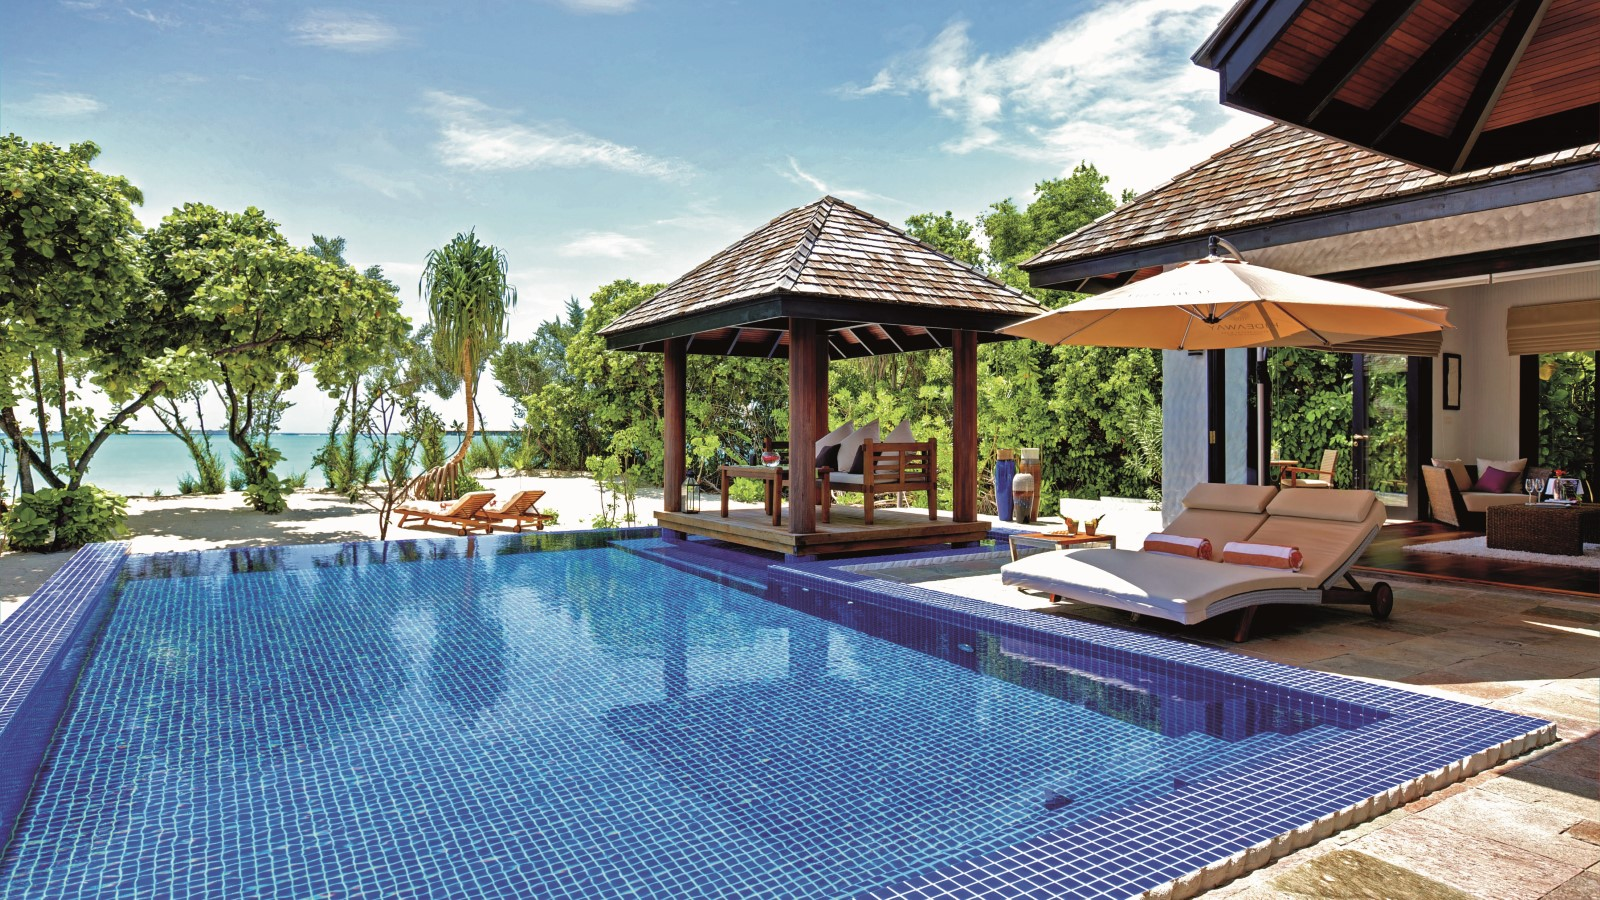 Мальдивы, Отель Hideaway Beach Resort & Spa, номер Two Bedroom Family Villa with Pool